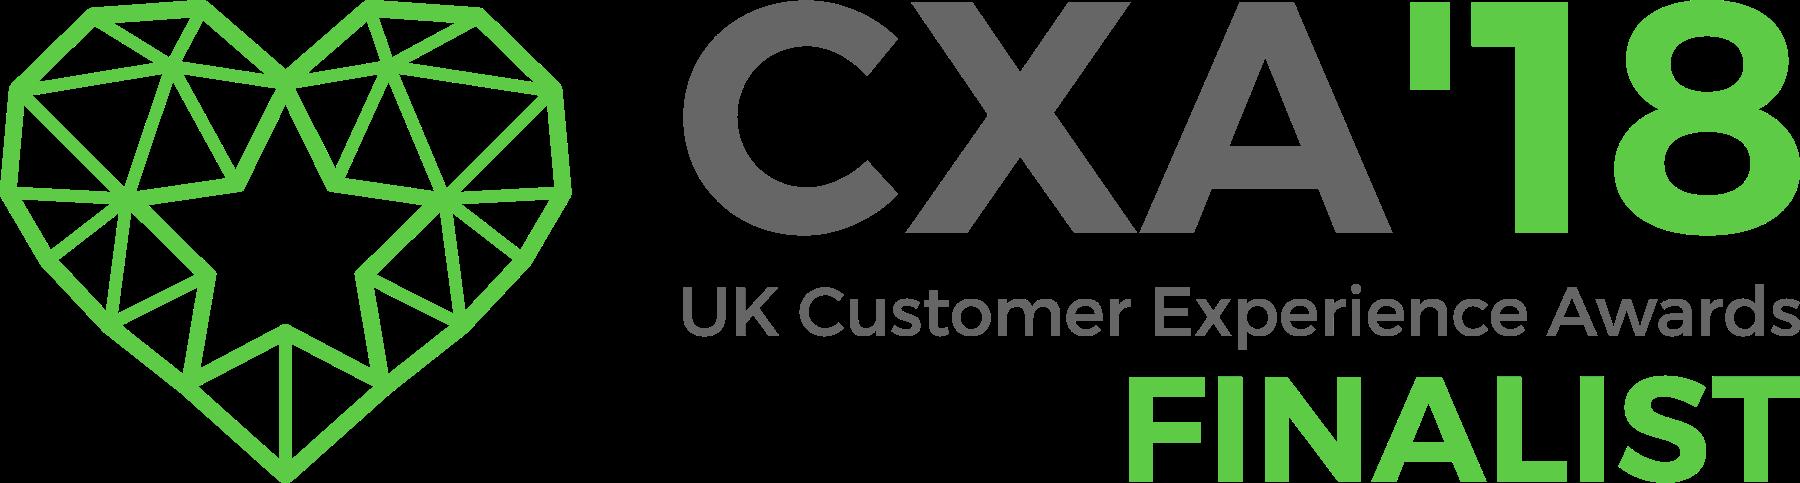 CXA18 Finalist logo